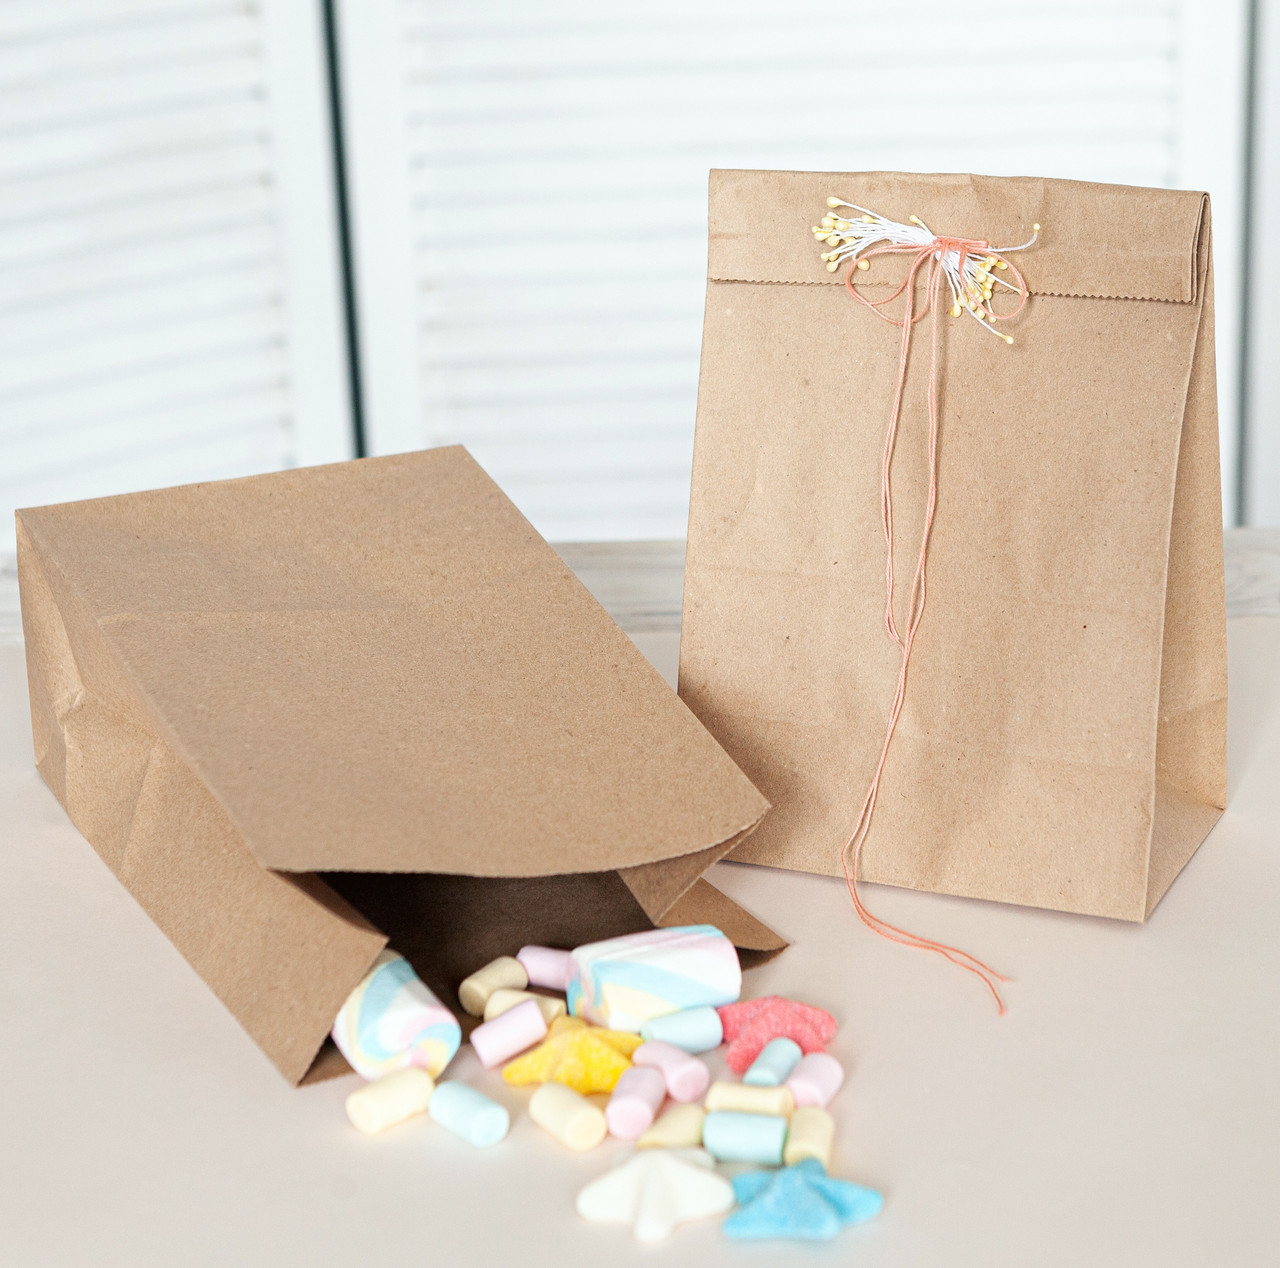 Паперовий пакет з плоским дном 150*90*240 мм крафт пакет, упаковка 500 штук